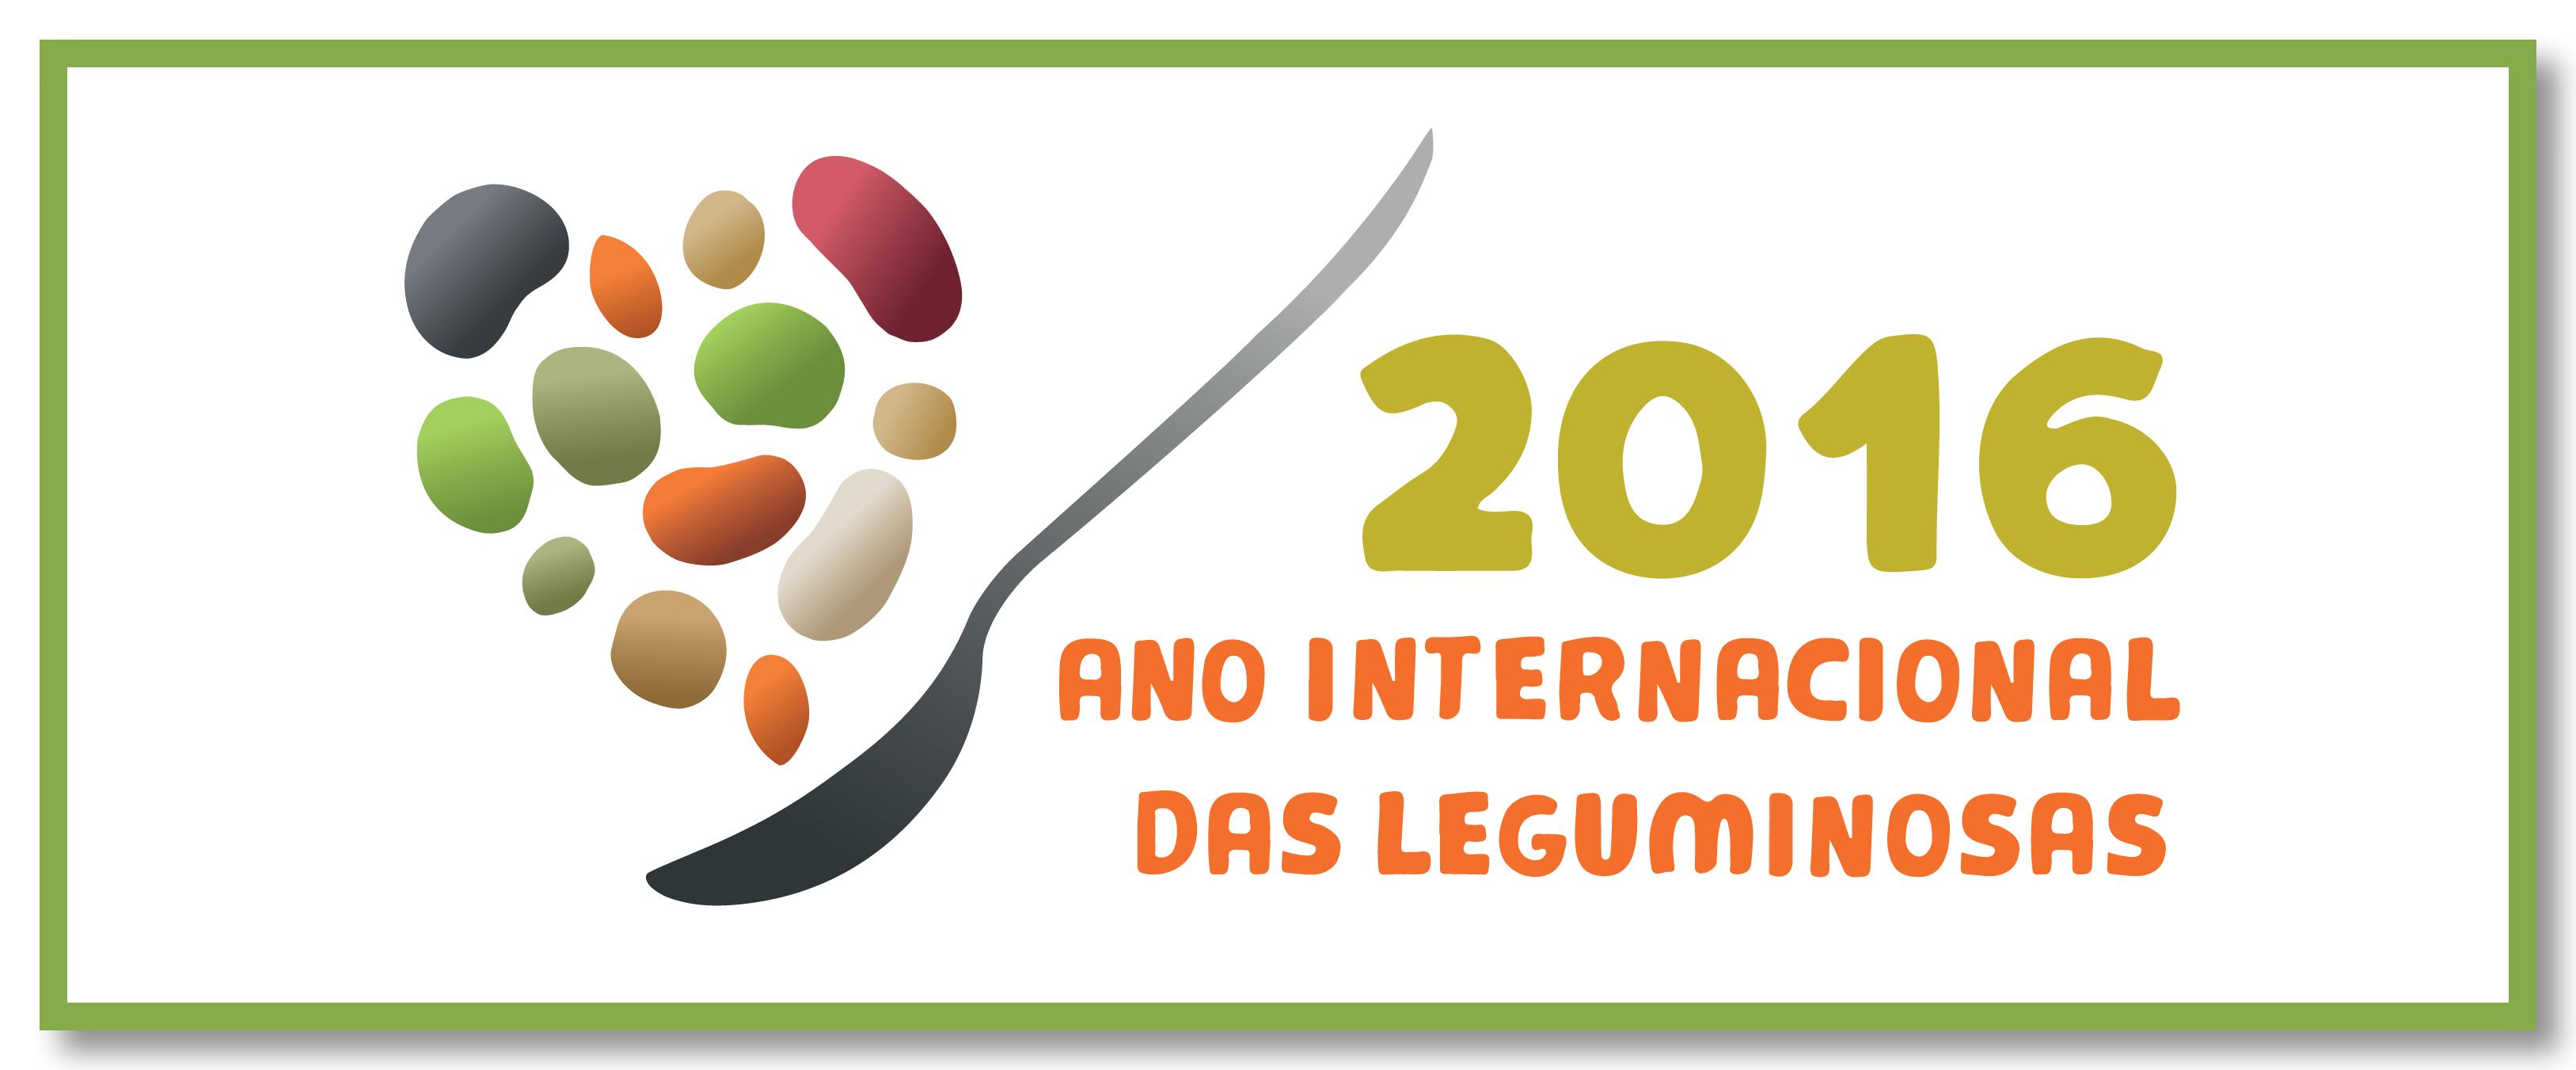 ano internacional da leguminosas 2016